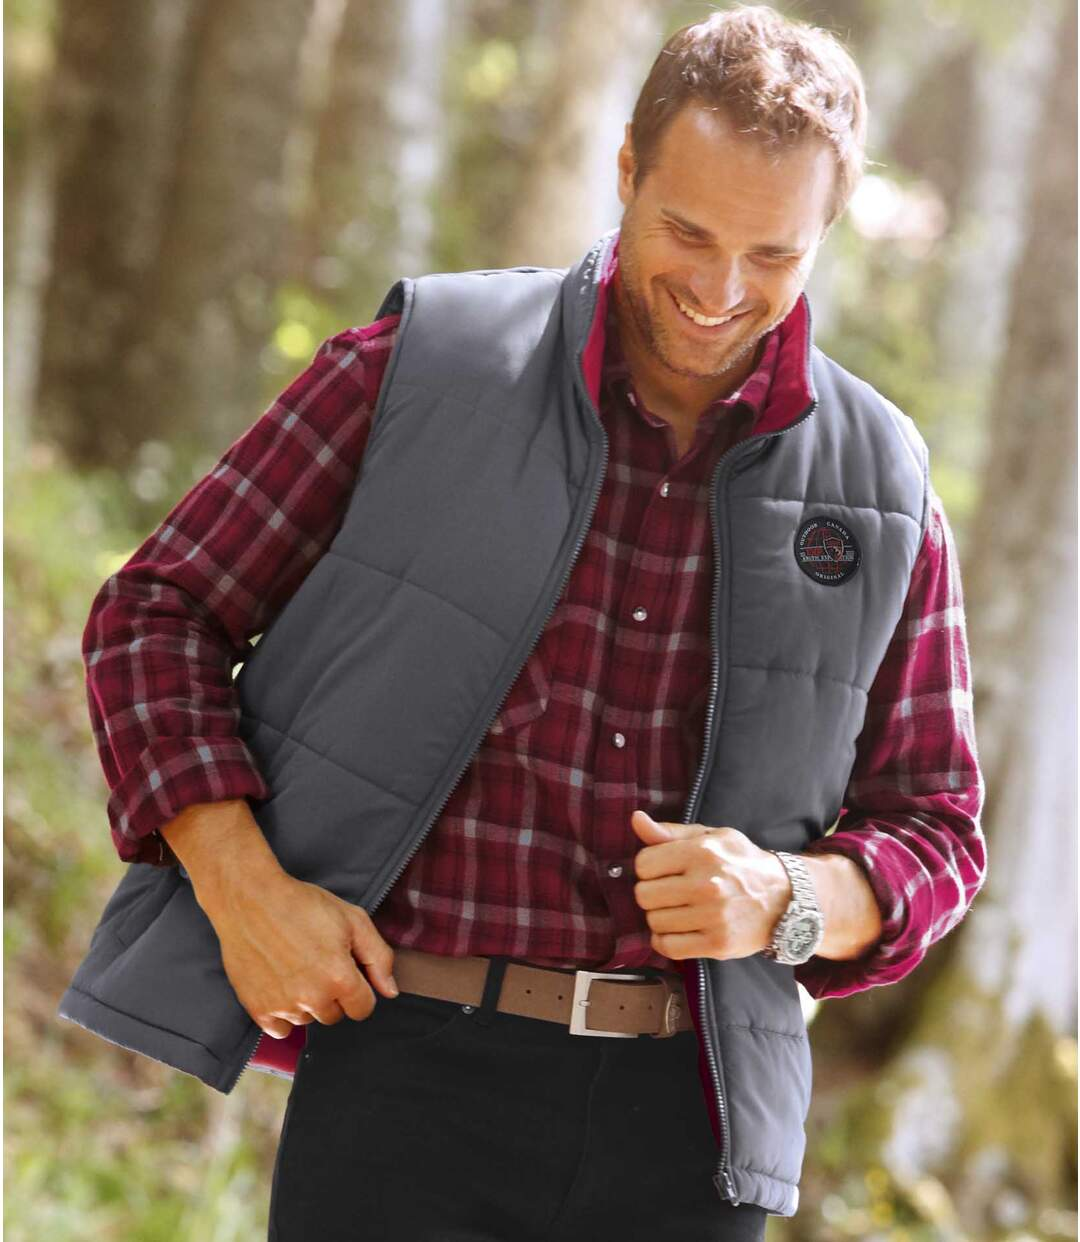 Men's Outdoor Sleeveless Padded Gilet - Grey